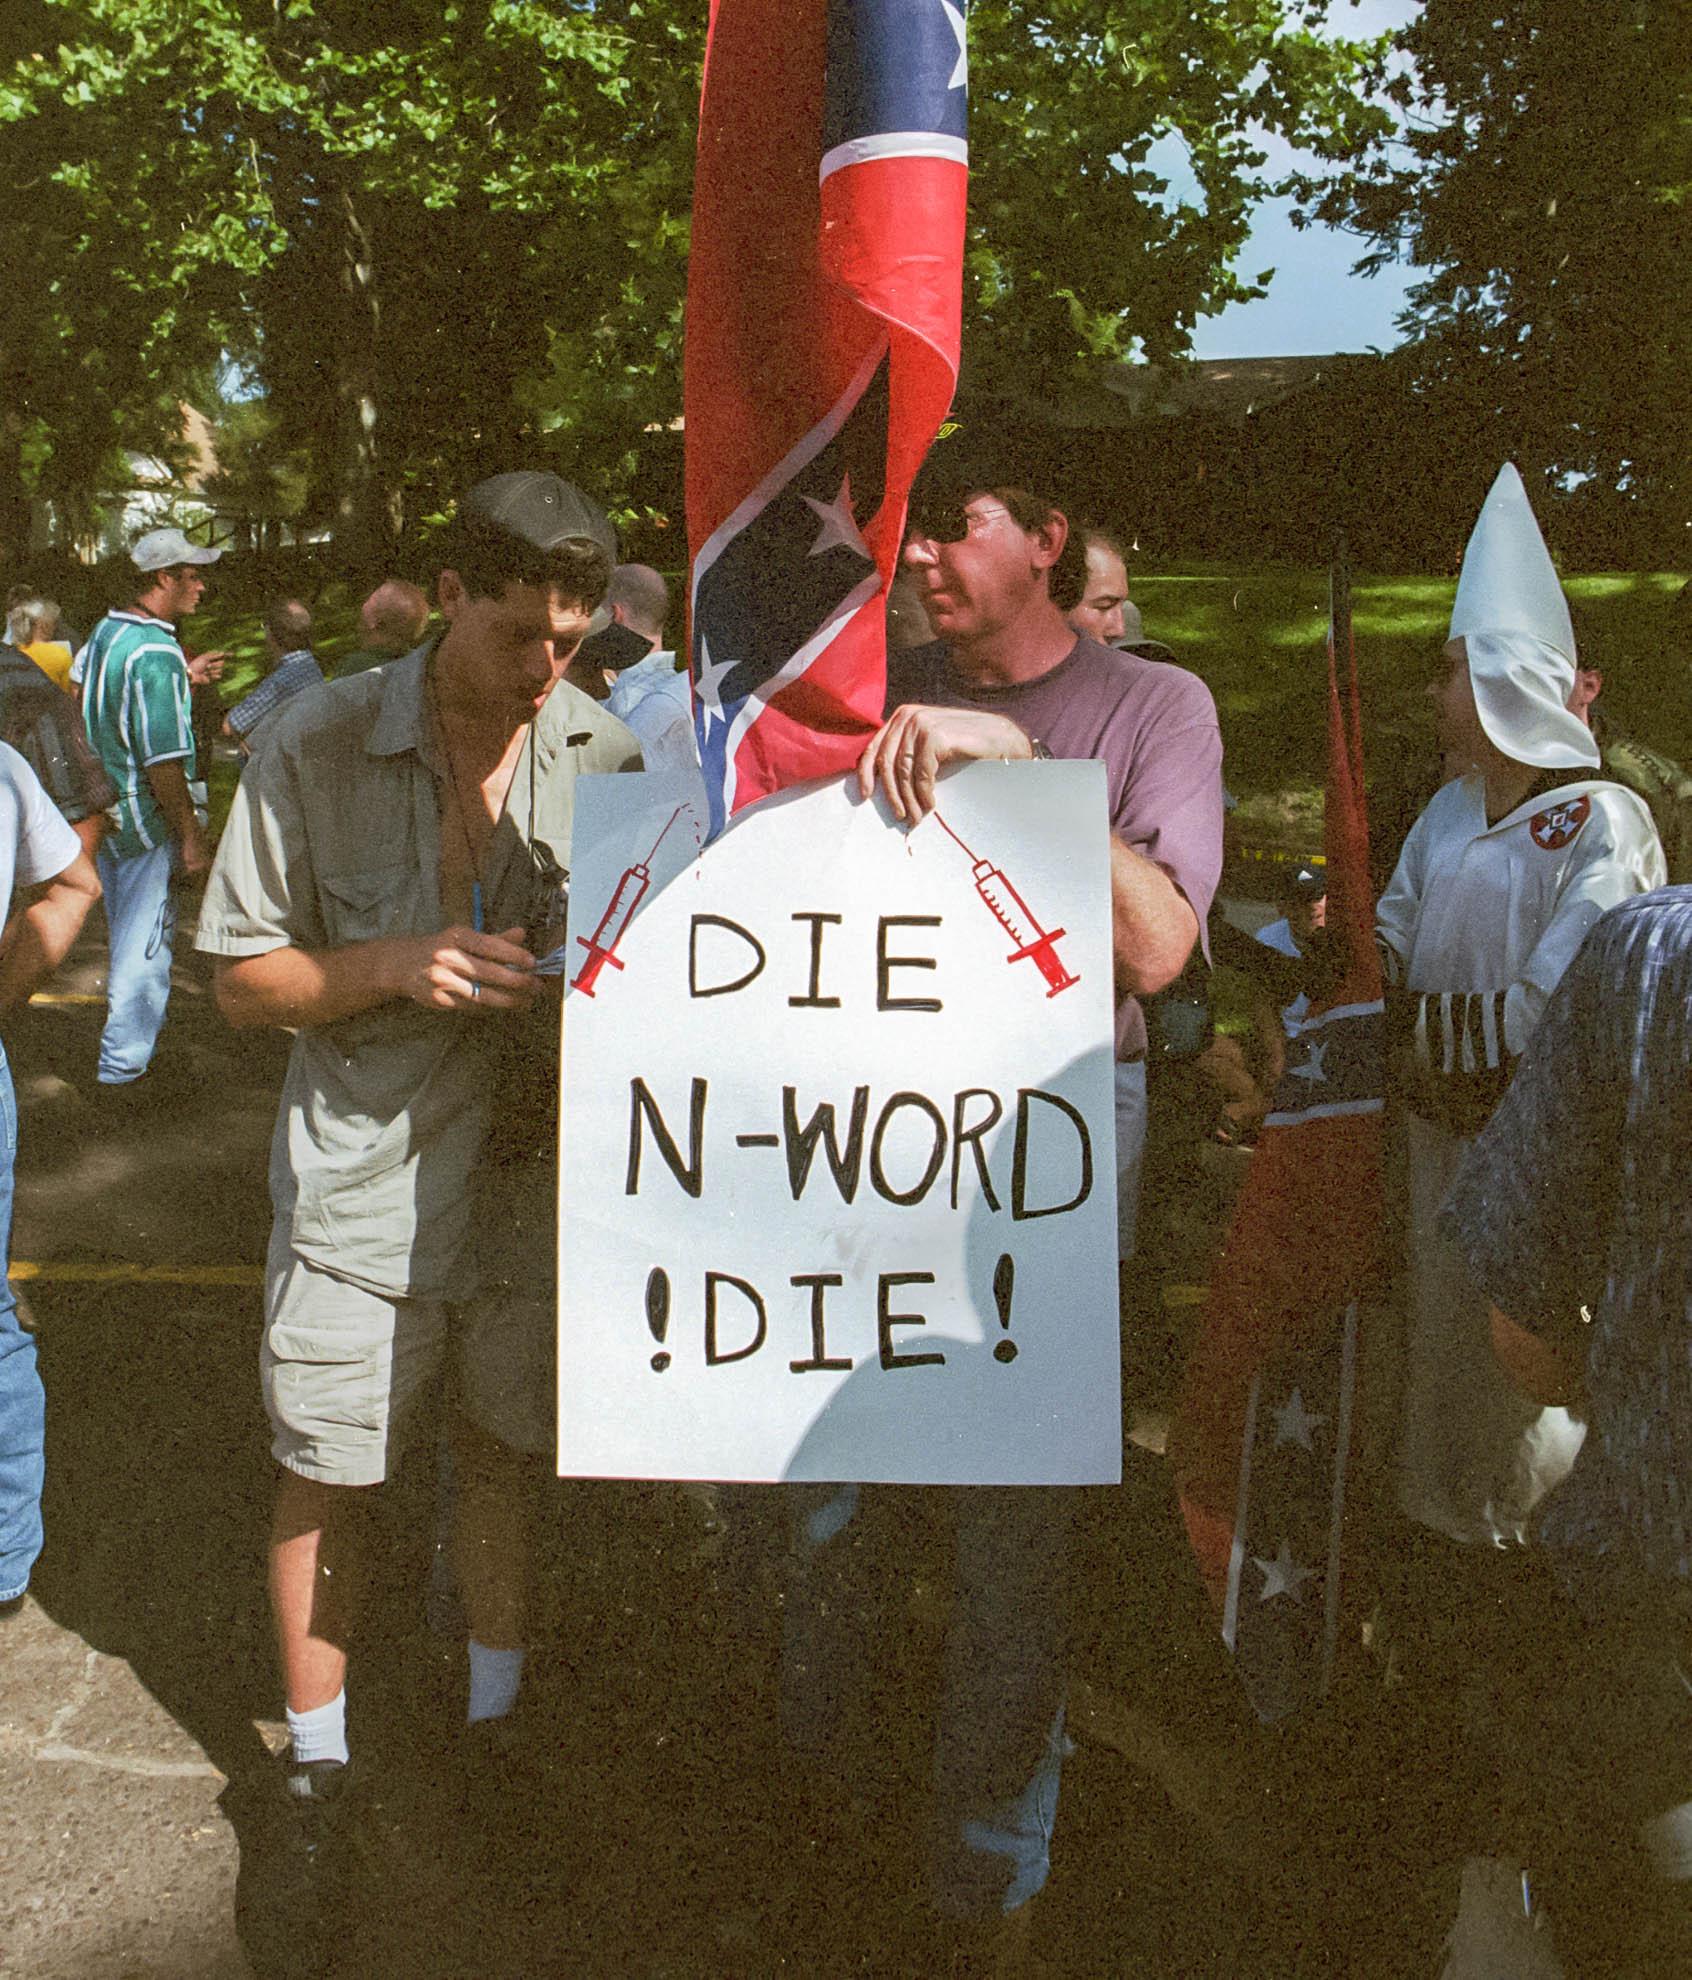 death penalty, photography, photos, execution, KKK, documentary, texas, huntsville, protest, support, pro, gary graham, race